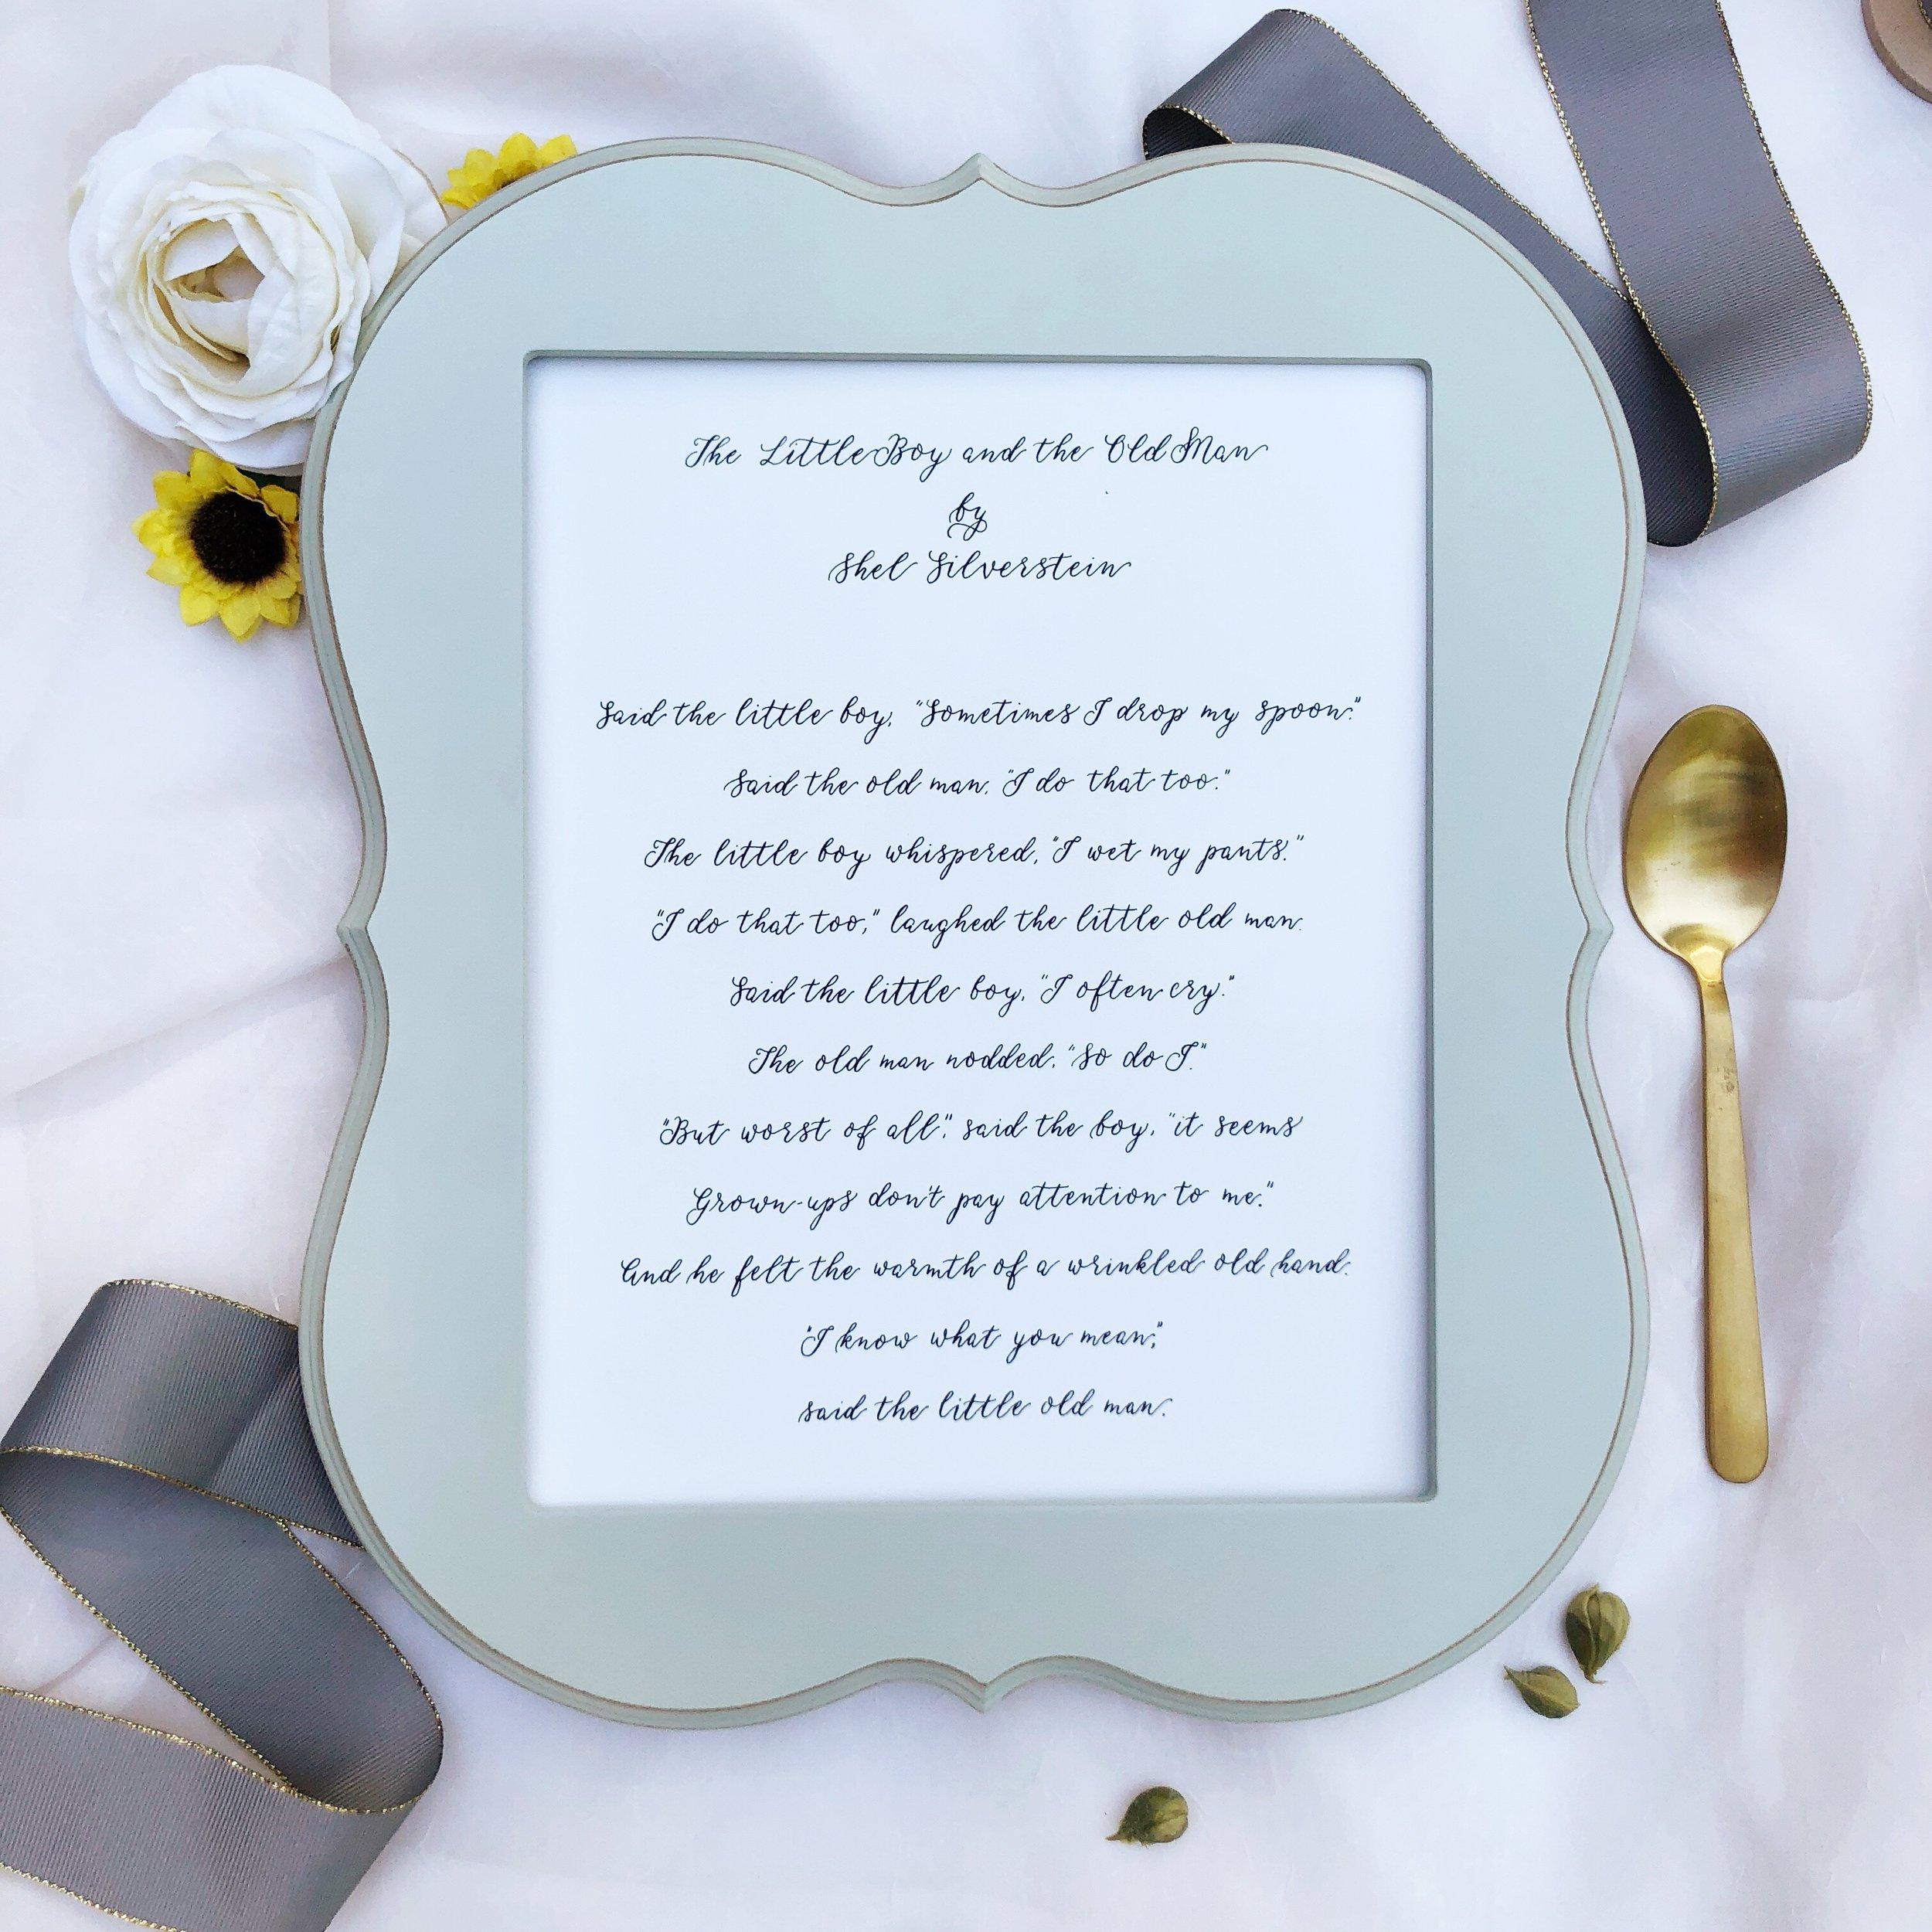 Central PA, York PA, JesSmith Designs, custom, wedding, invitations, bridal, announcements, save the date, baby, hanover, calligraphy, baltimore, wedding invitations, lancaster, gettysburg-05-24 11.48.57.jpg